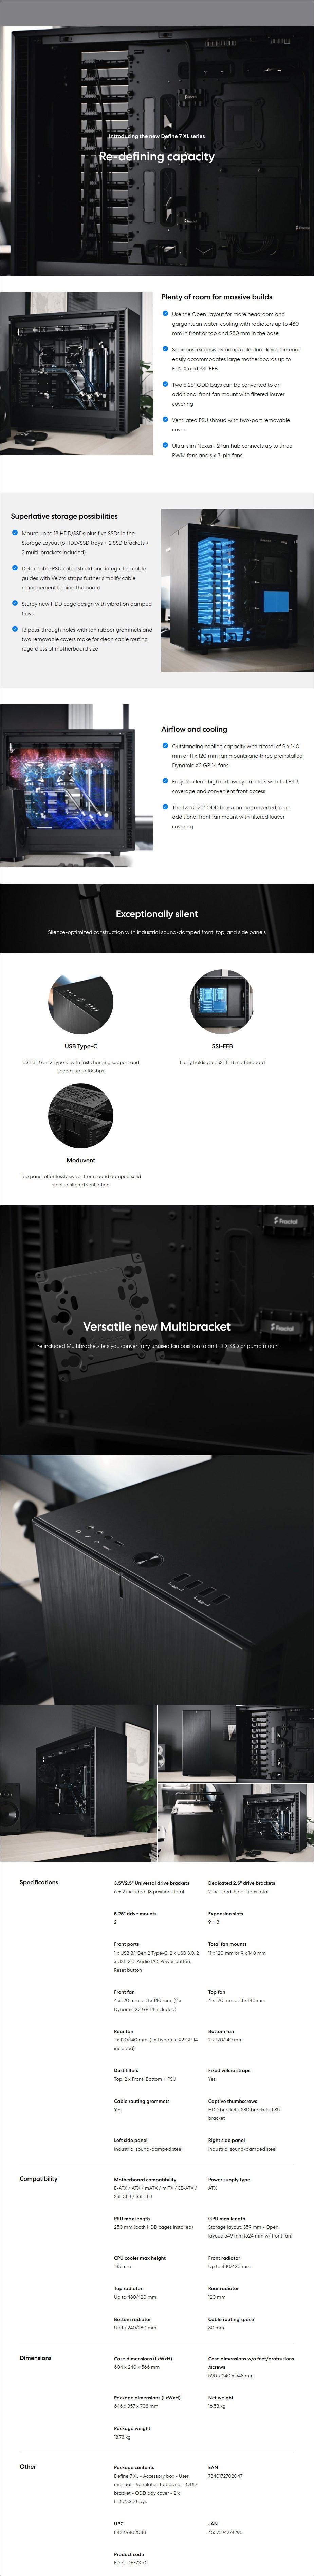 Fractal Design Define 7 XL Full-Tower E-ATX Case - Black - Overview 1